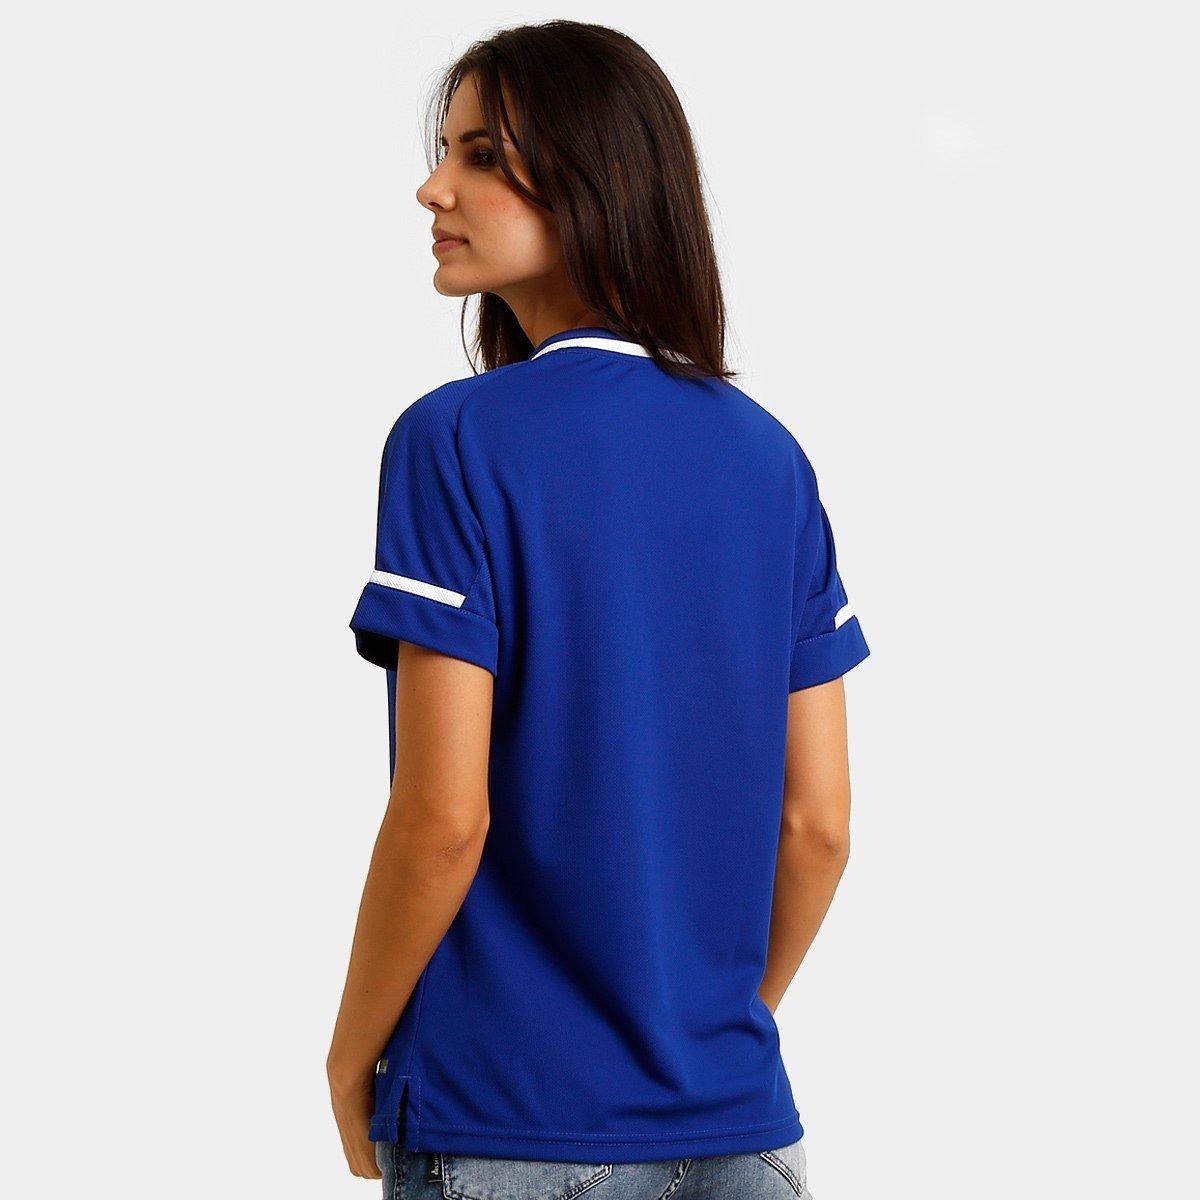 Camisa Penalty Cruzeiro 1 2015 - Feminina Tam. Gg - R  129 dfb04bf03f314